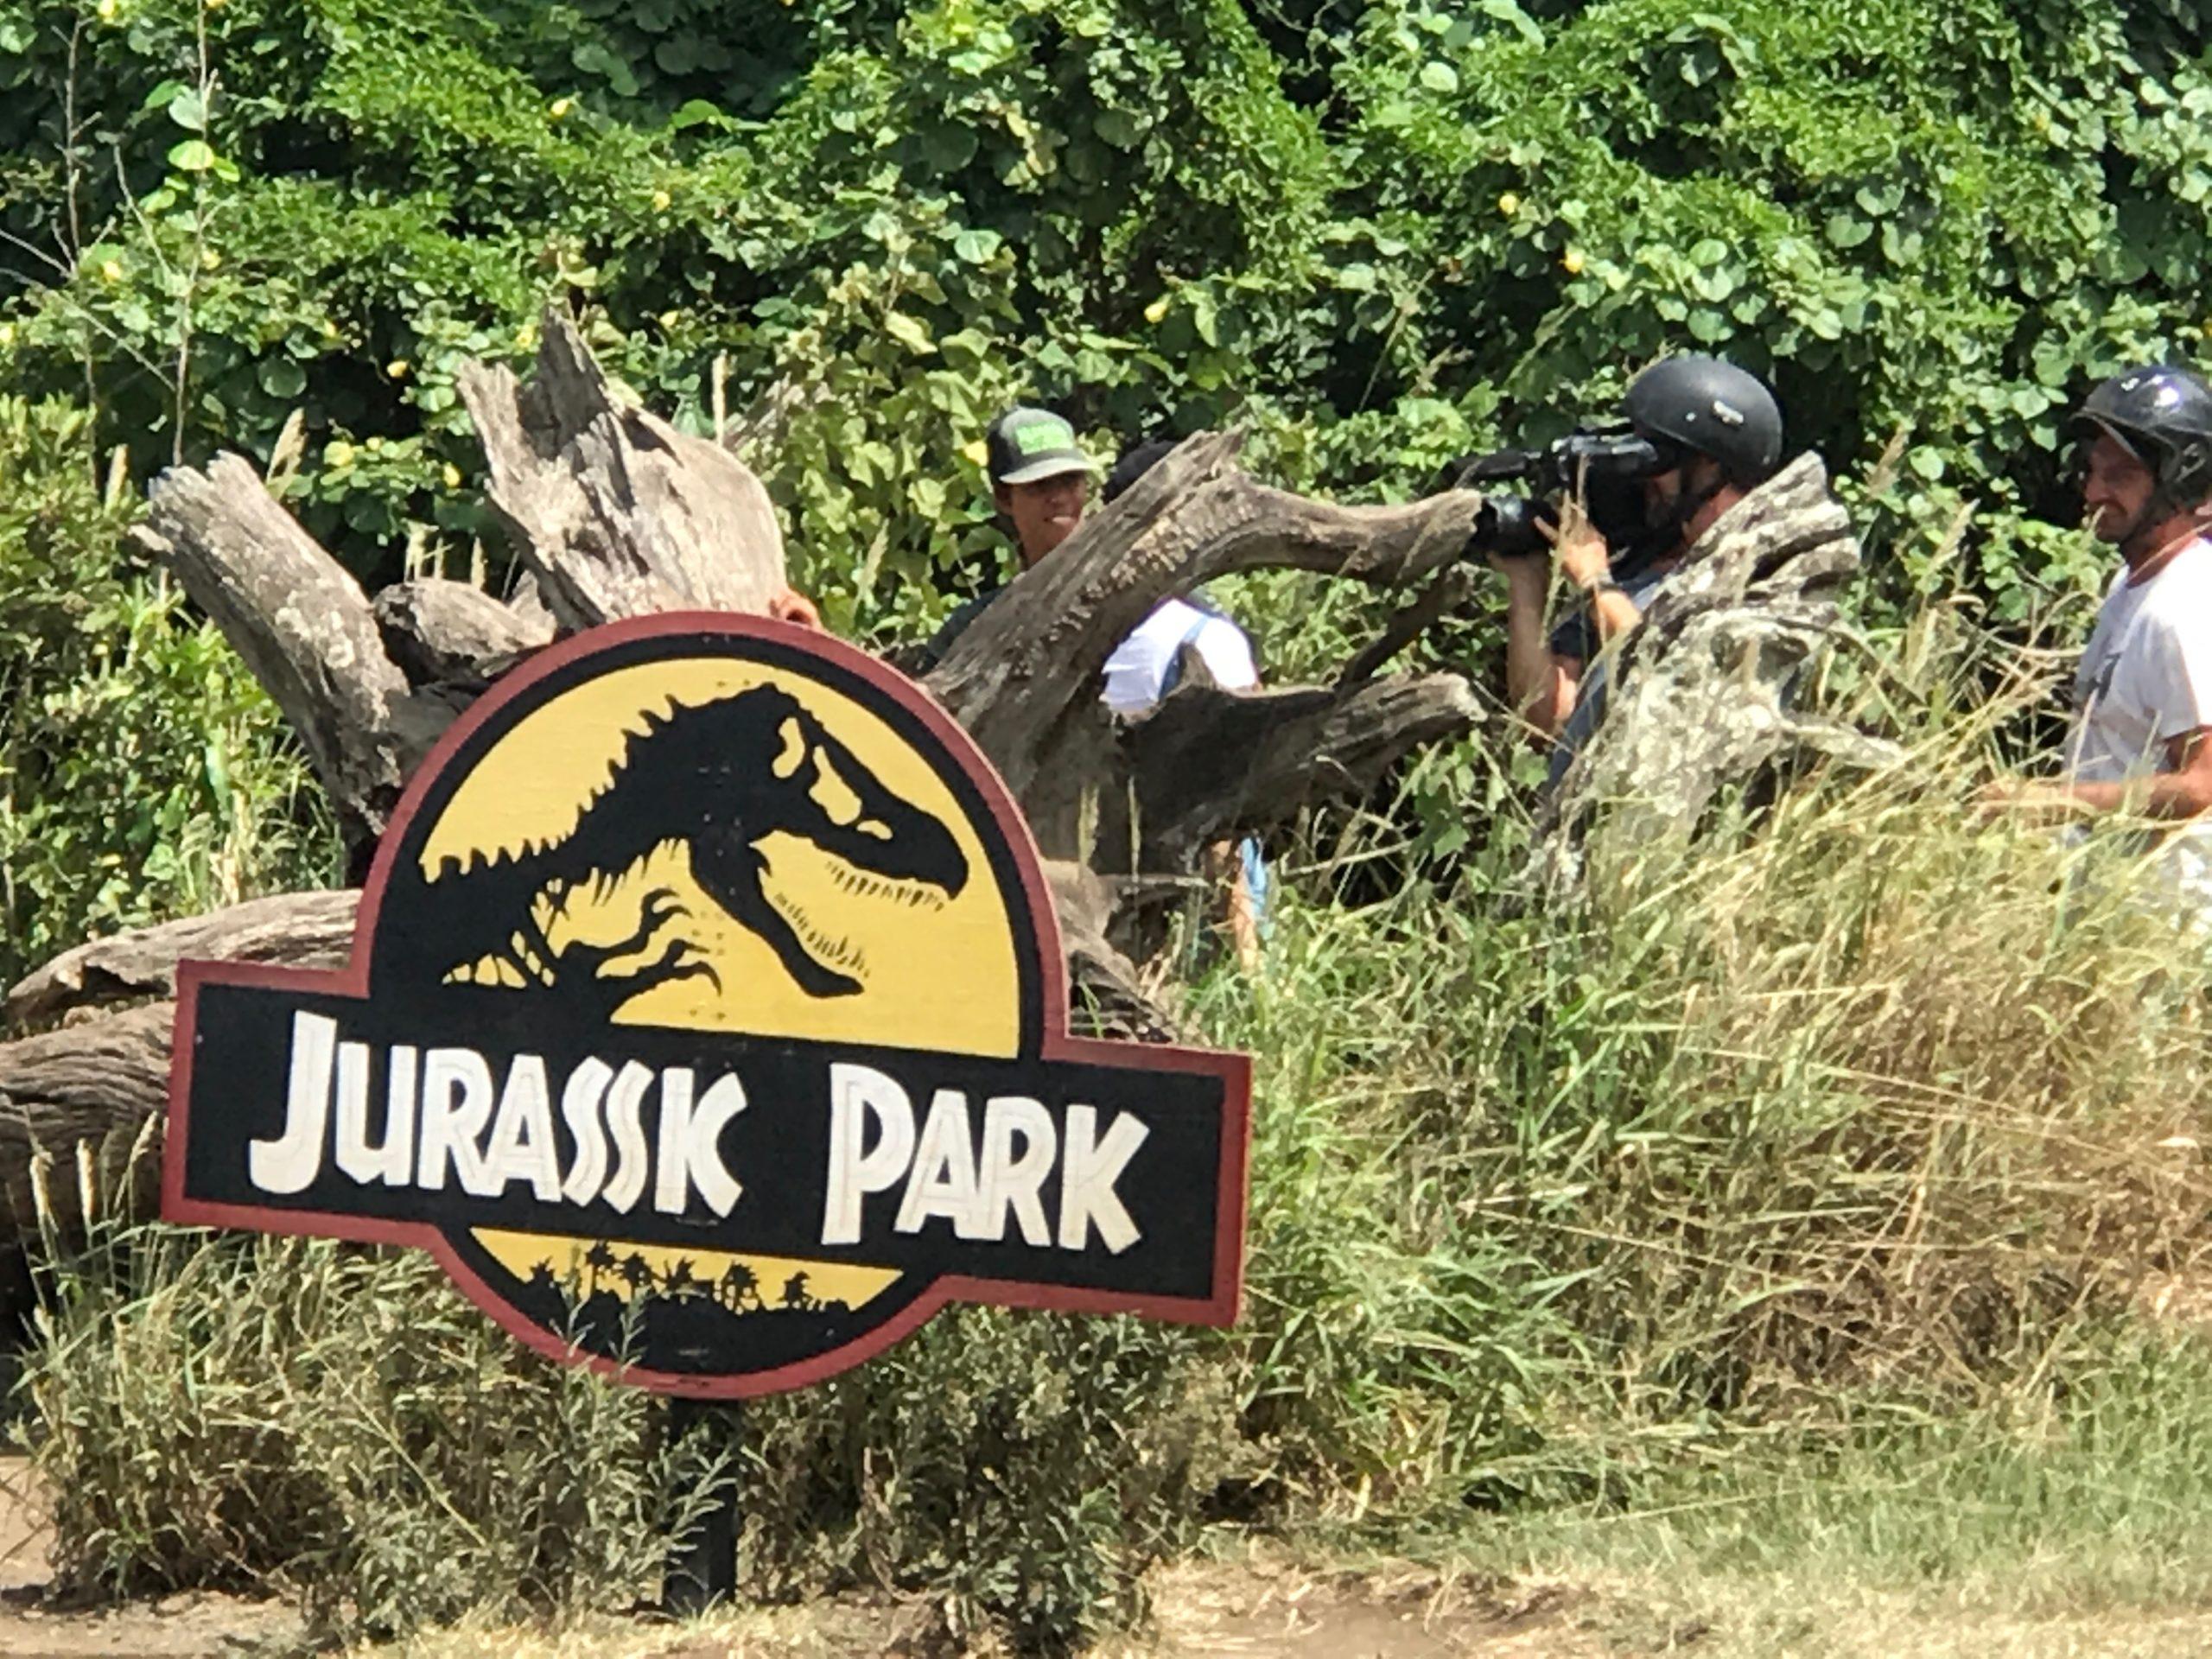 Jurassic Park Your & Movie Tour Kualoa Ranch Hawaii